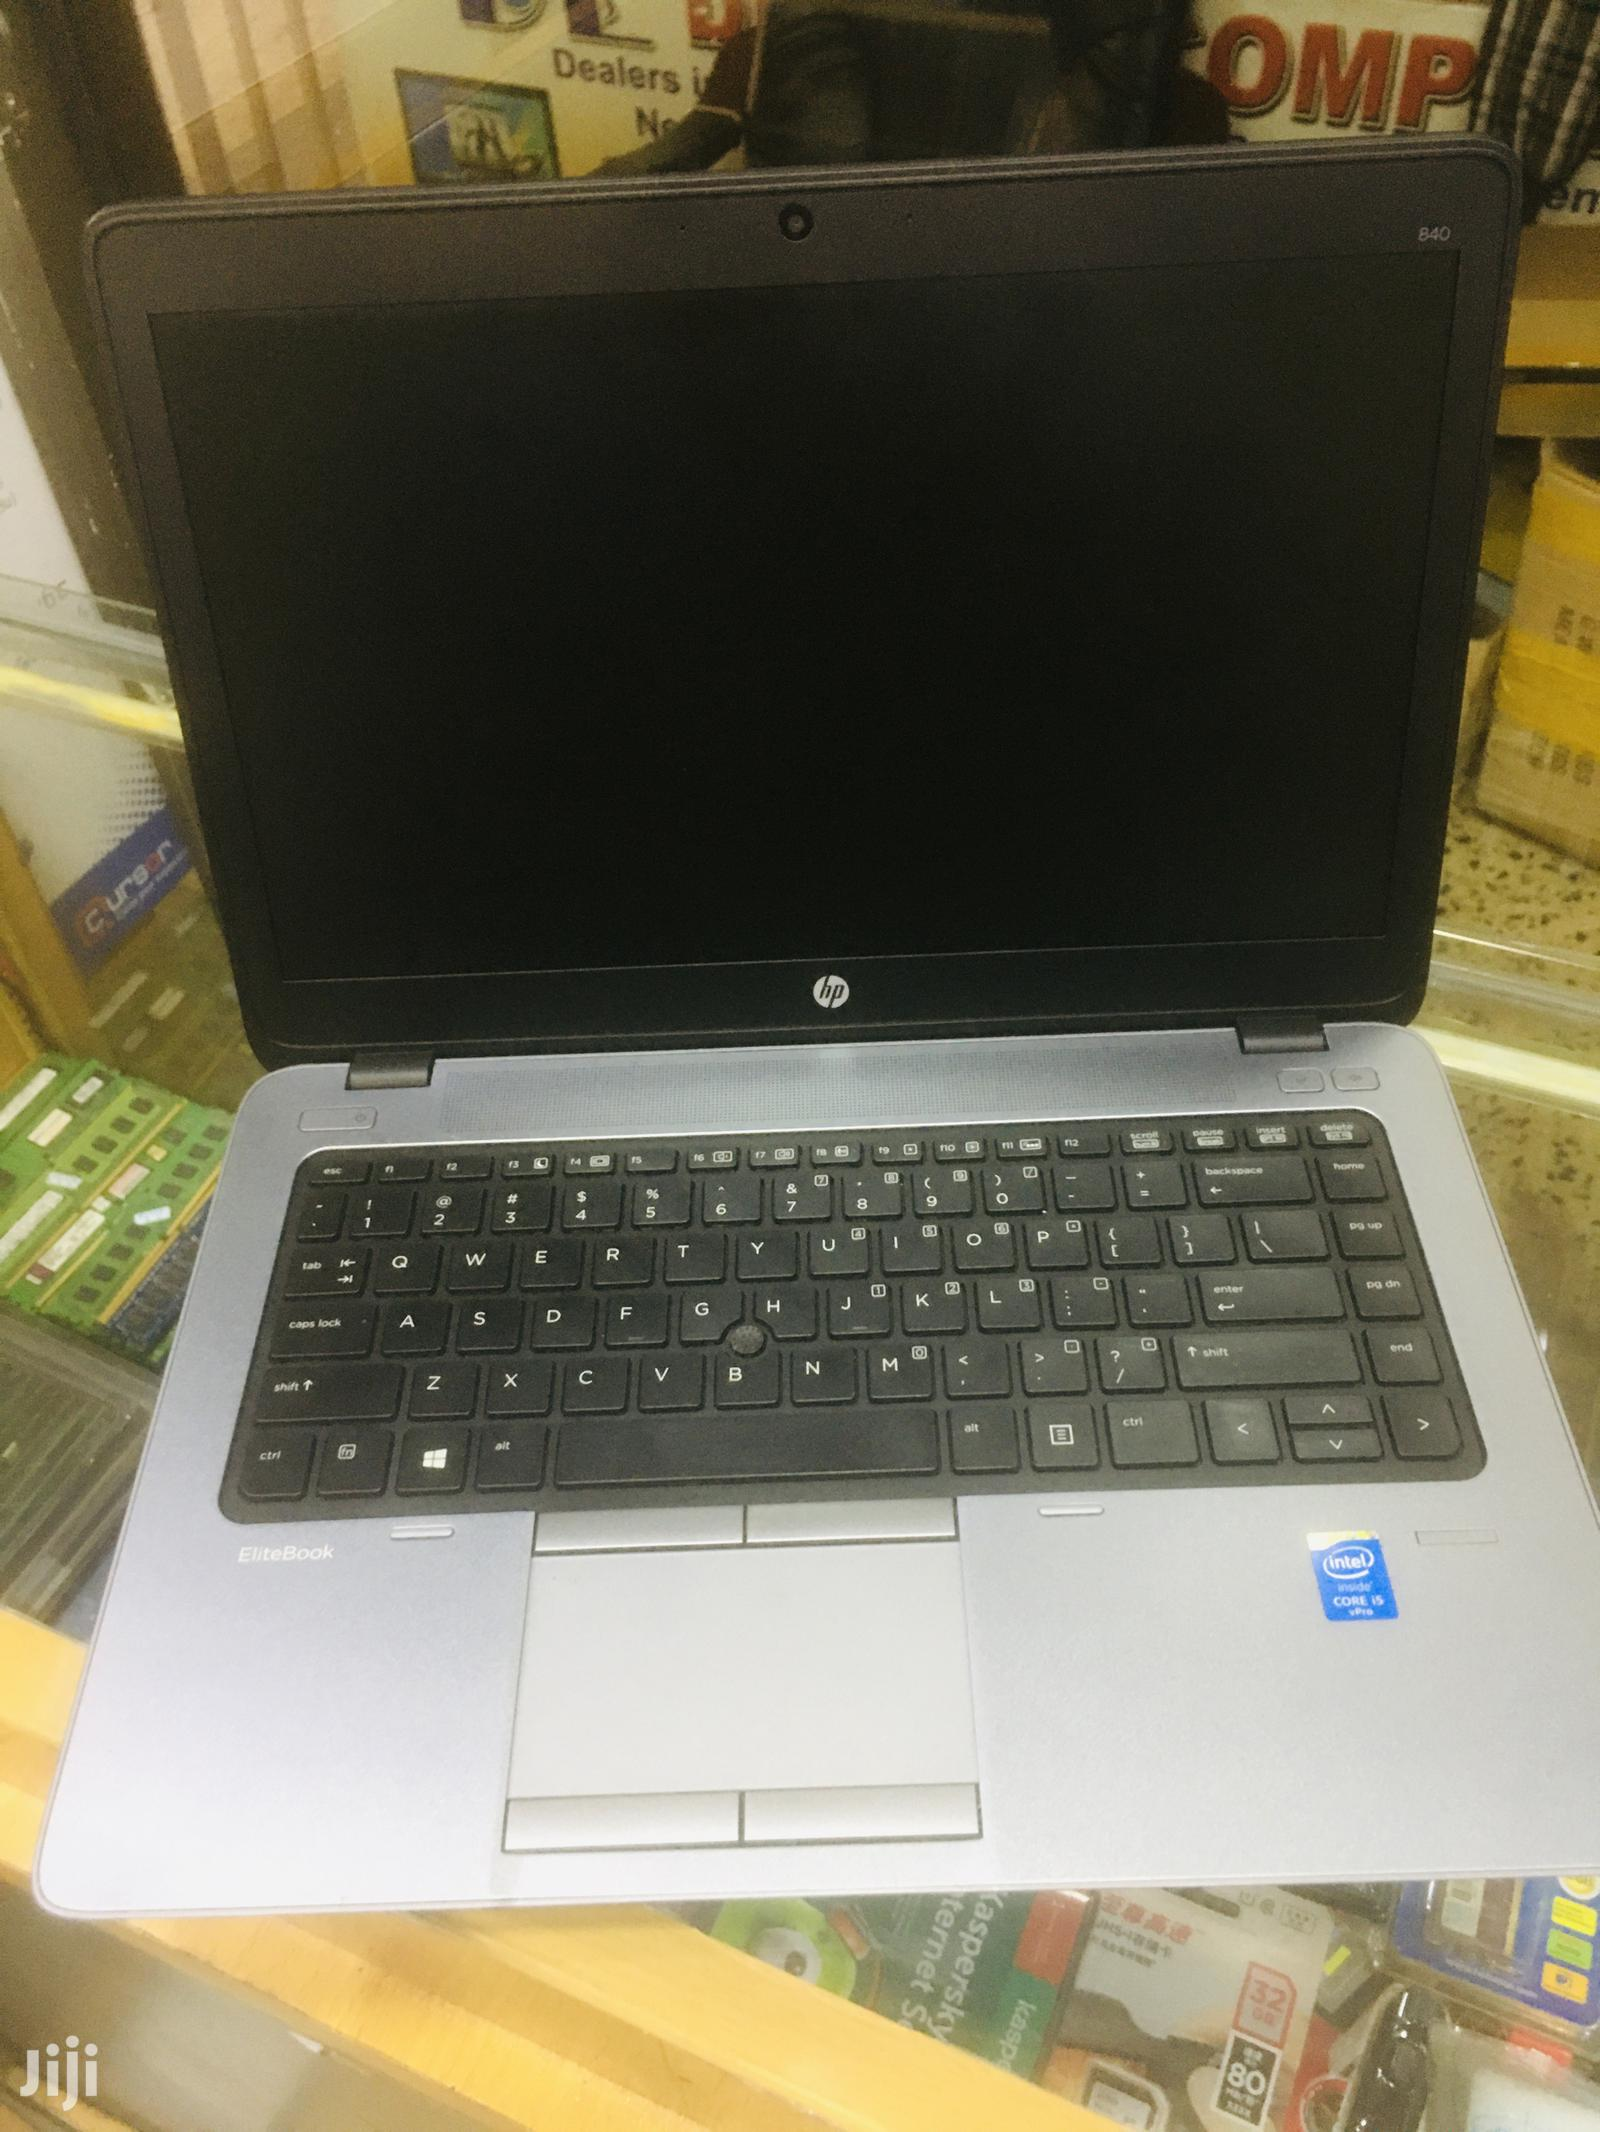 Laptop HP EliteBook 840 4GB Intel Core i5 HDD 500GB | Laptops & Computers for sale in Kampala, Central Region, Uganda